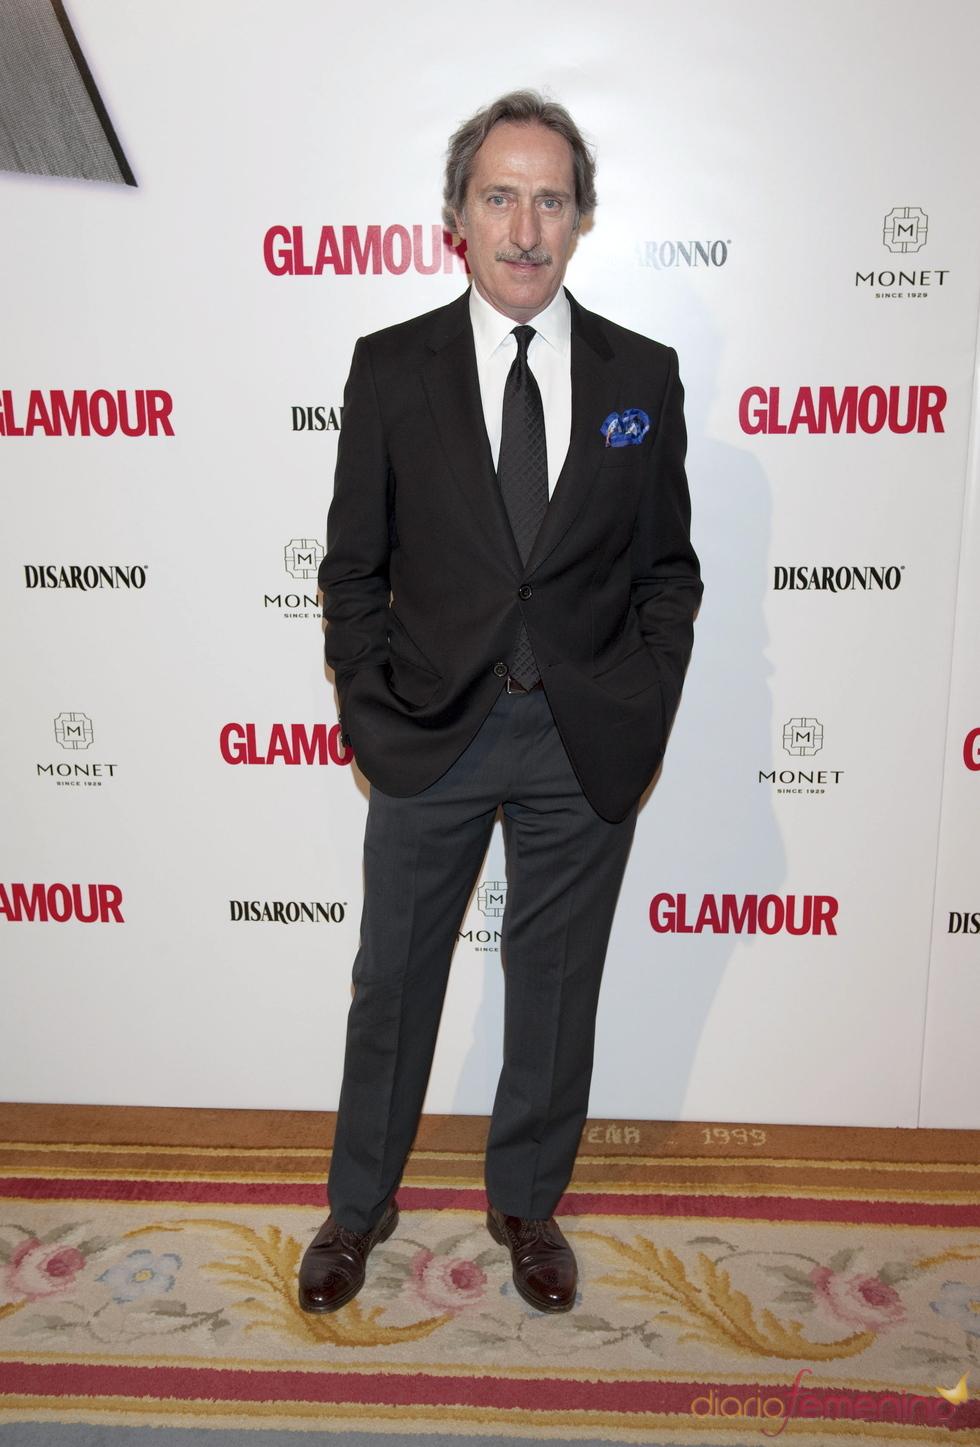 Premios Top Glamour 2010 con Roberto Torreta